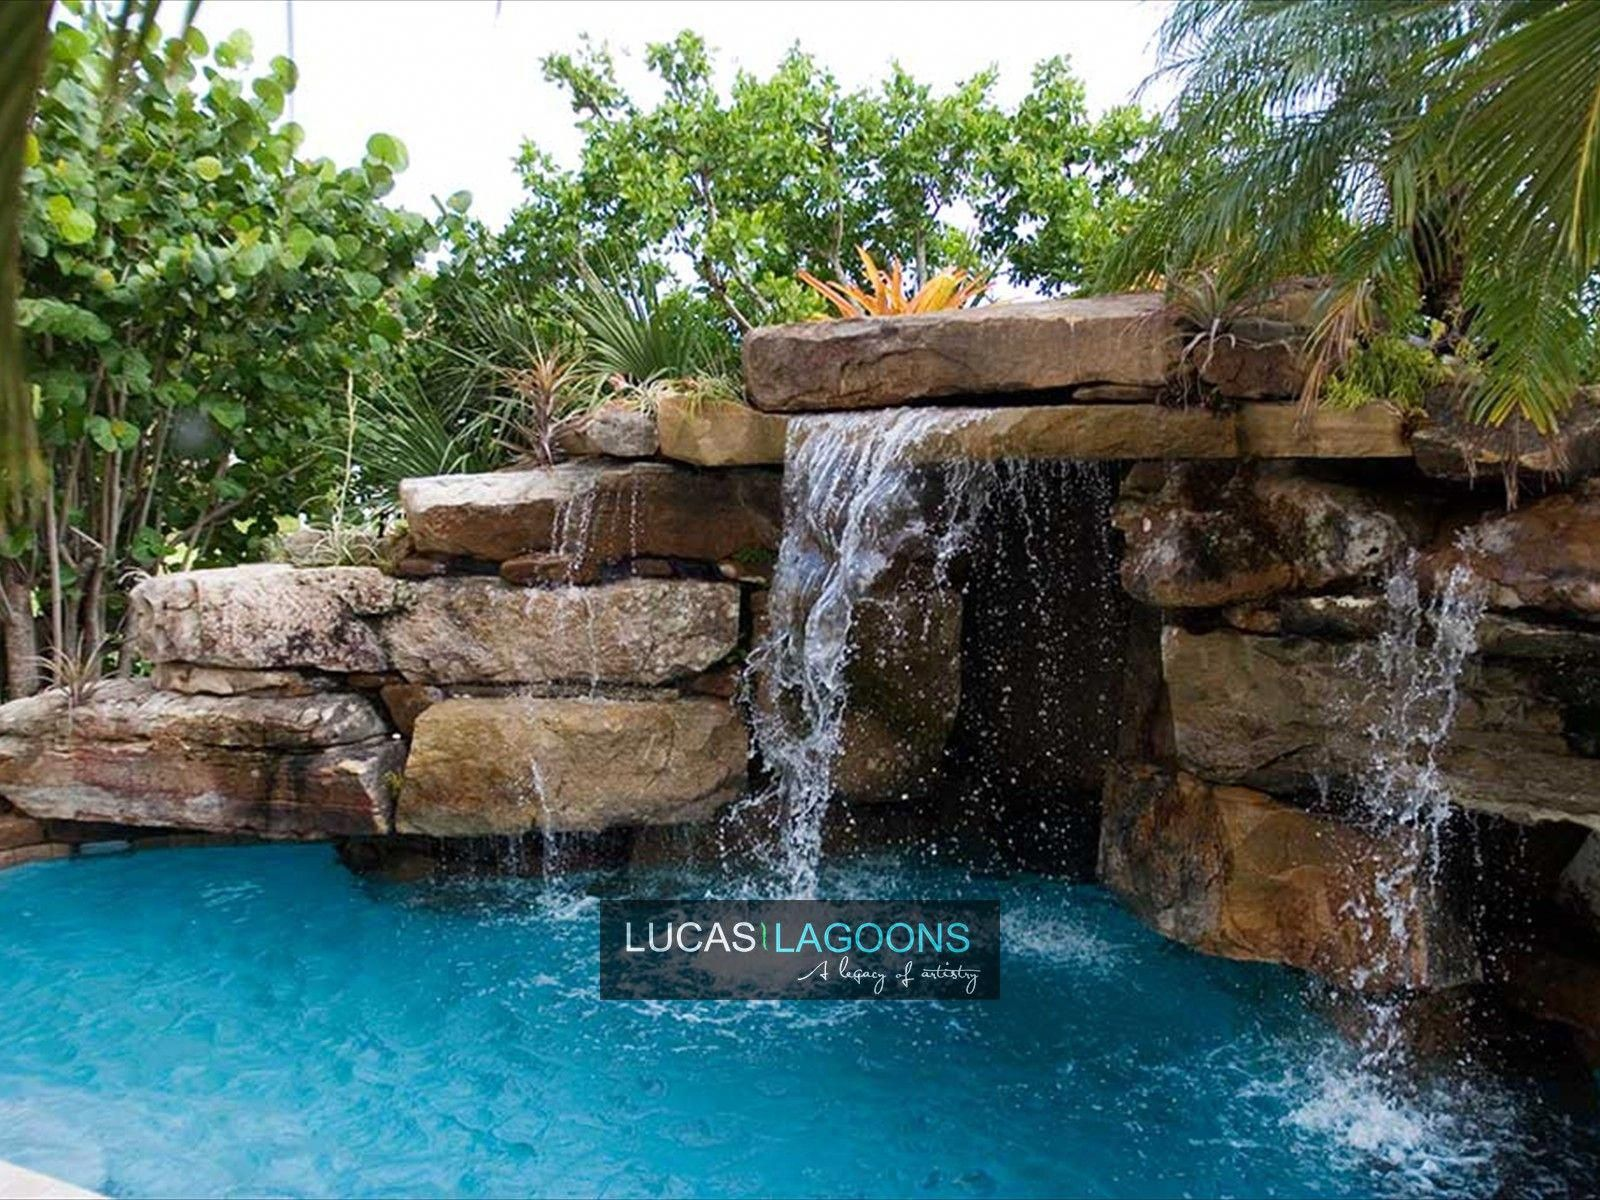 Lucas Lagoons Pools Portfolio Lucas Lagoons Pools Lagoon Pool Pool Waterfall Pool Landscaping